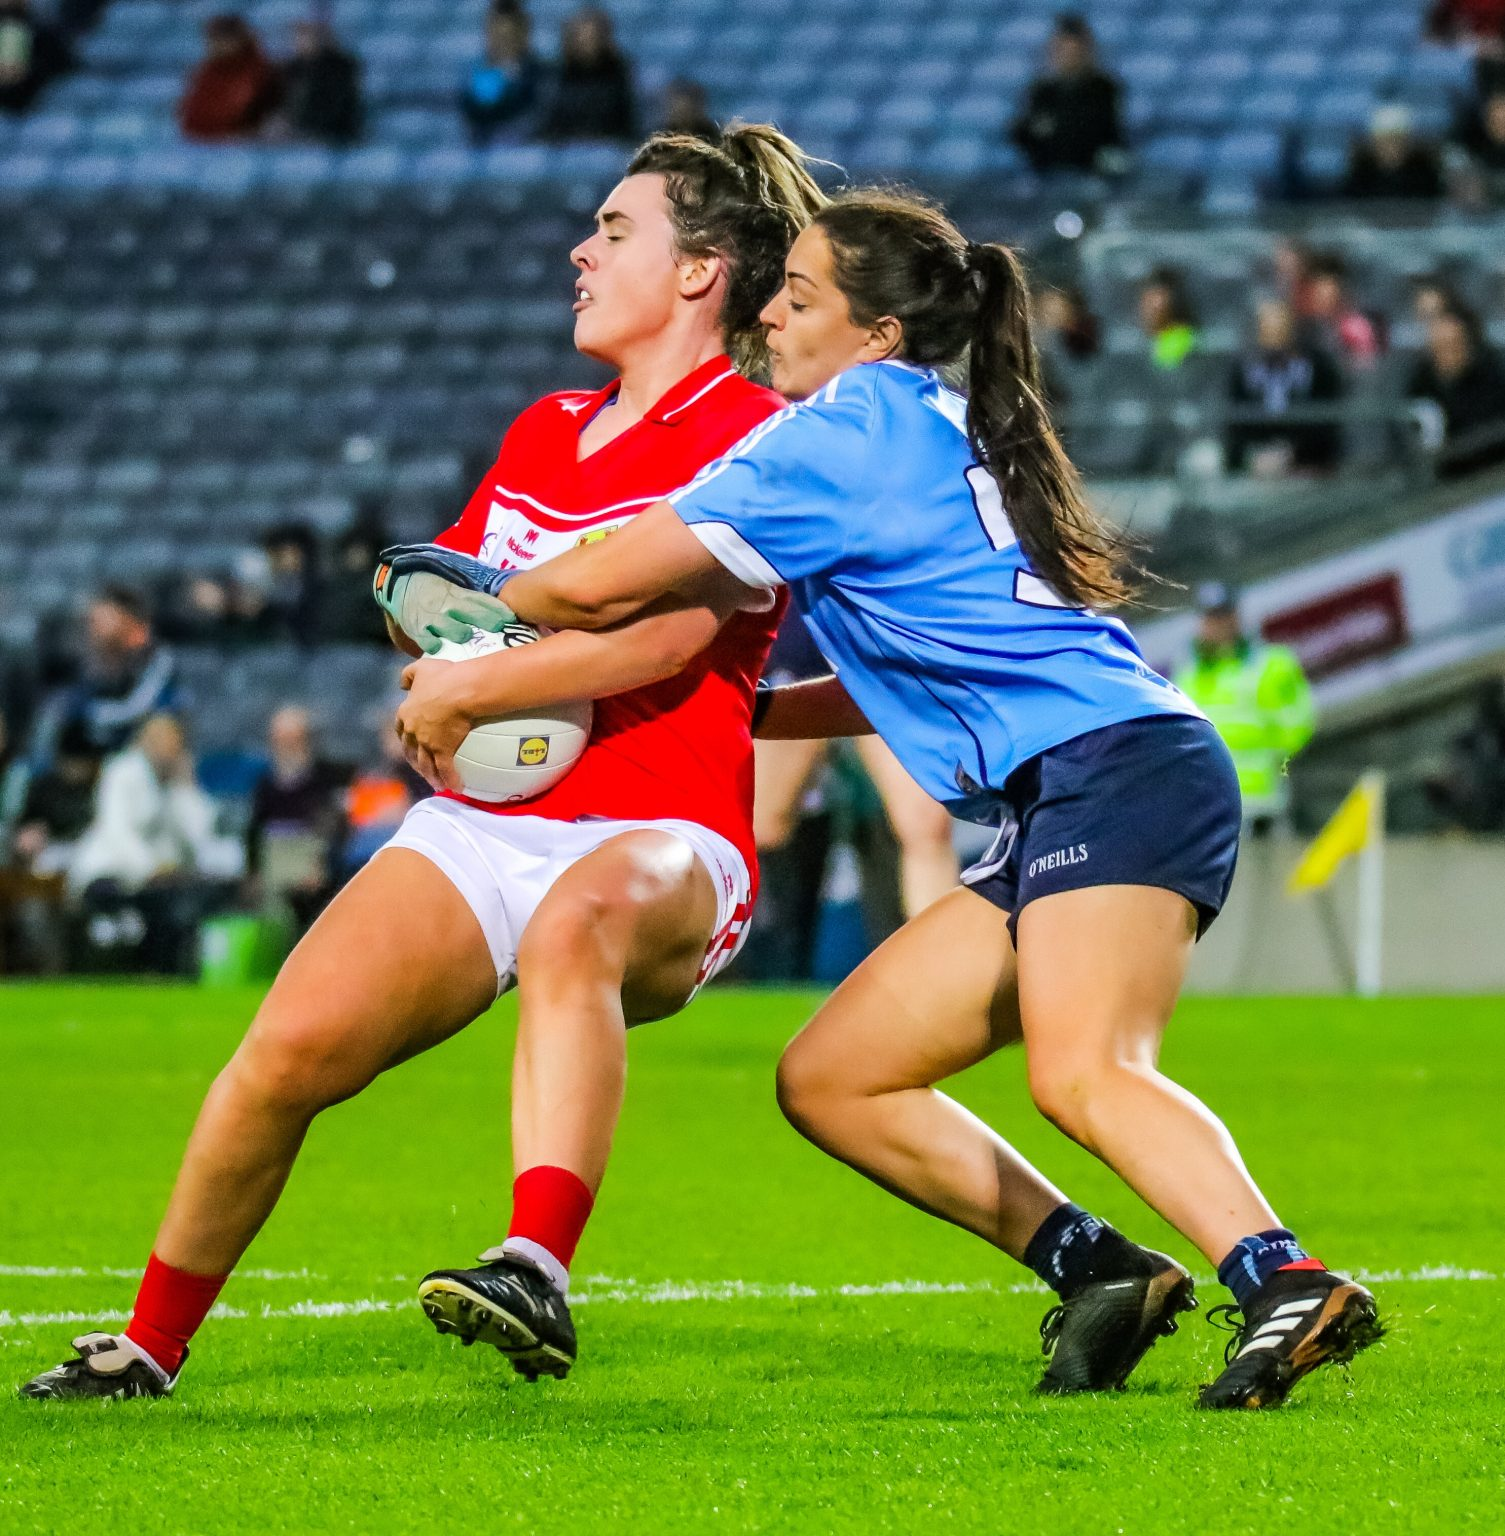 Dublin Half Back Sinead Goldrick Keeping Close Tabs On Corks Doireann O'Sullivan